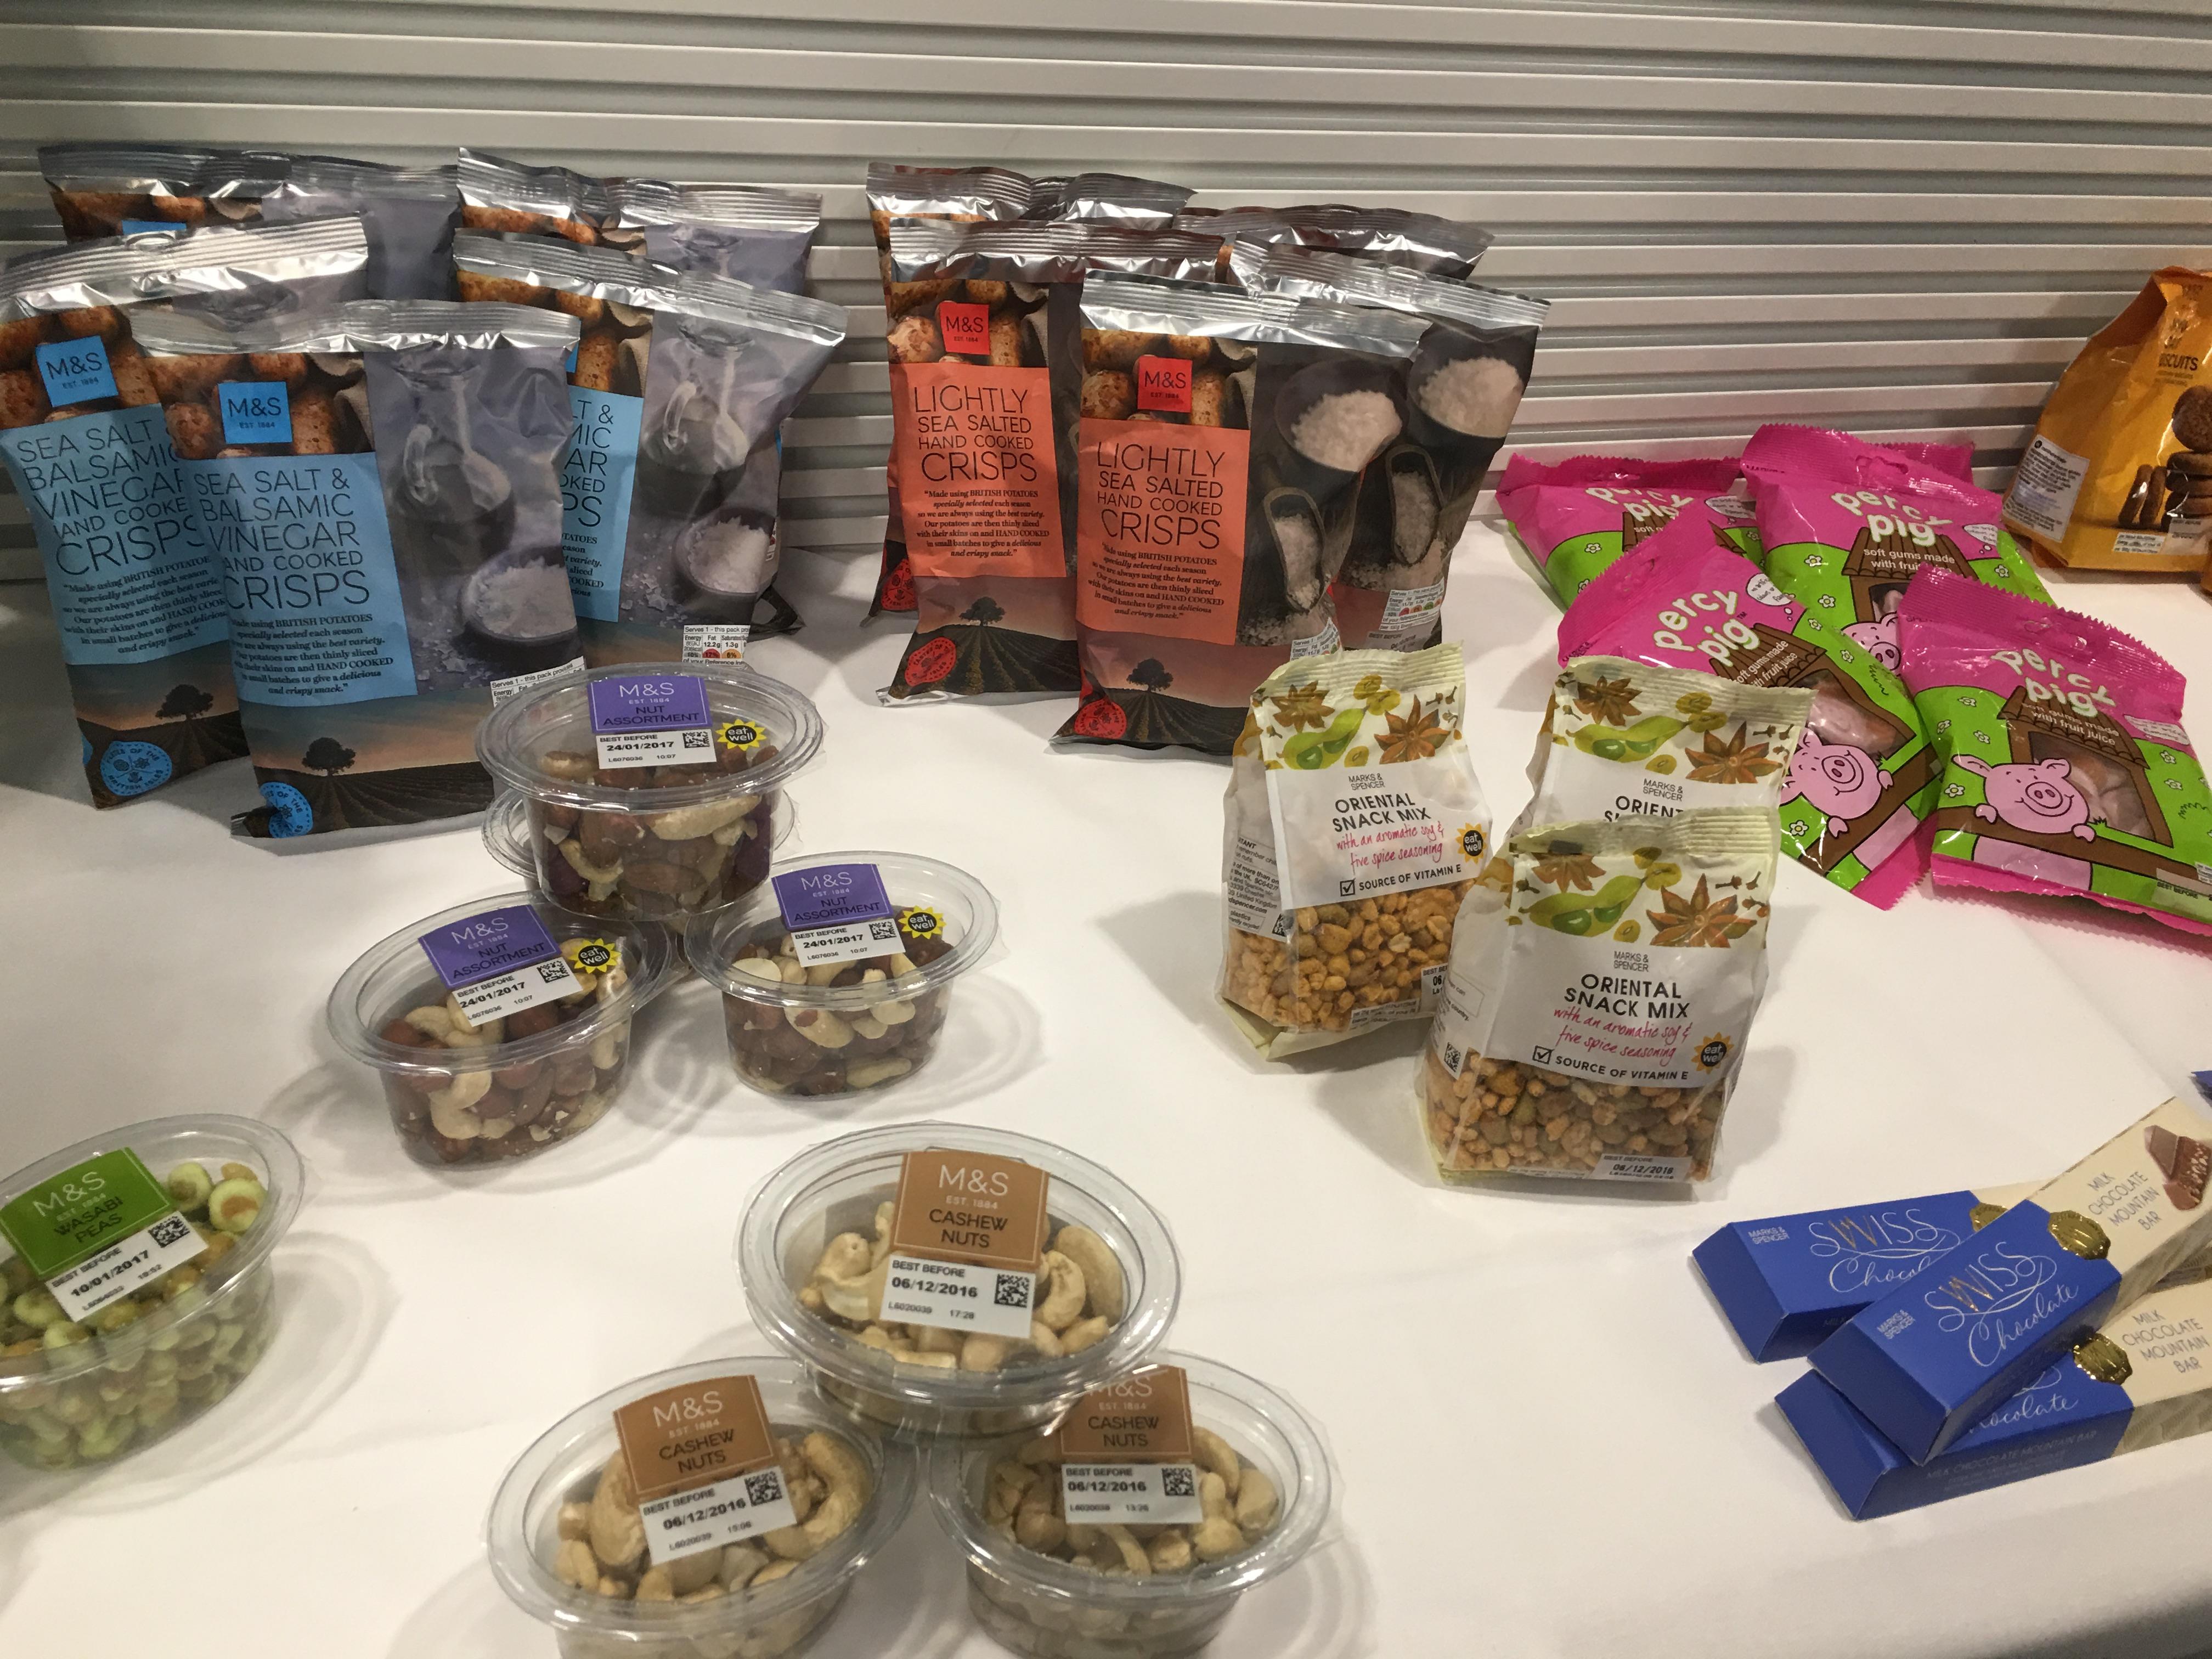 food ba drink water stop offering haul economy even short insideflyer snacks